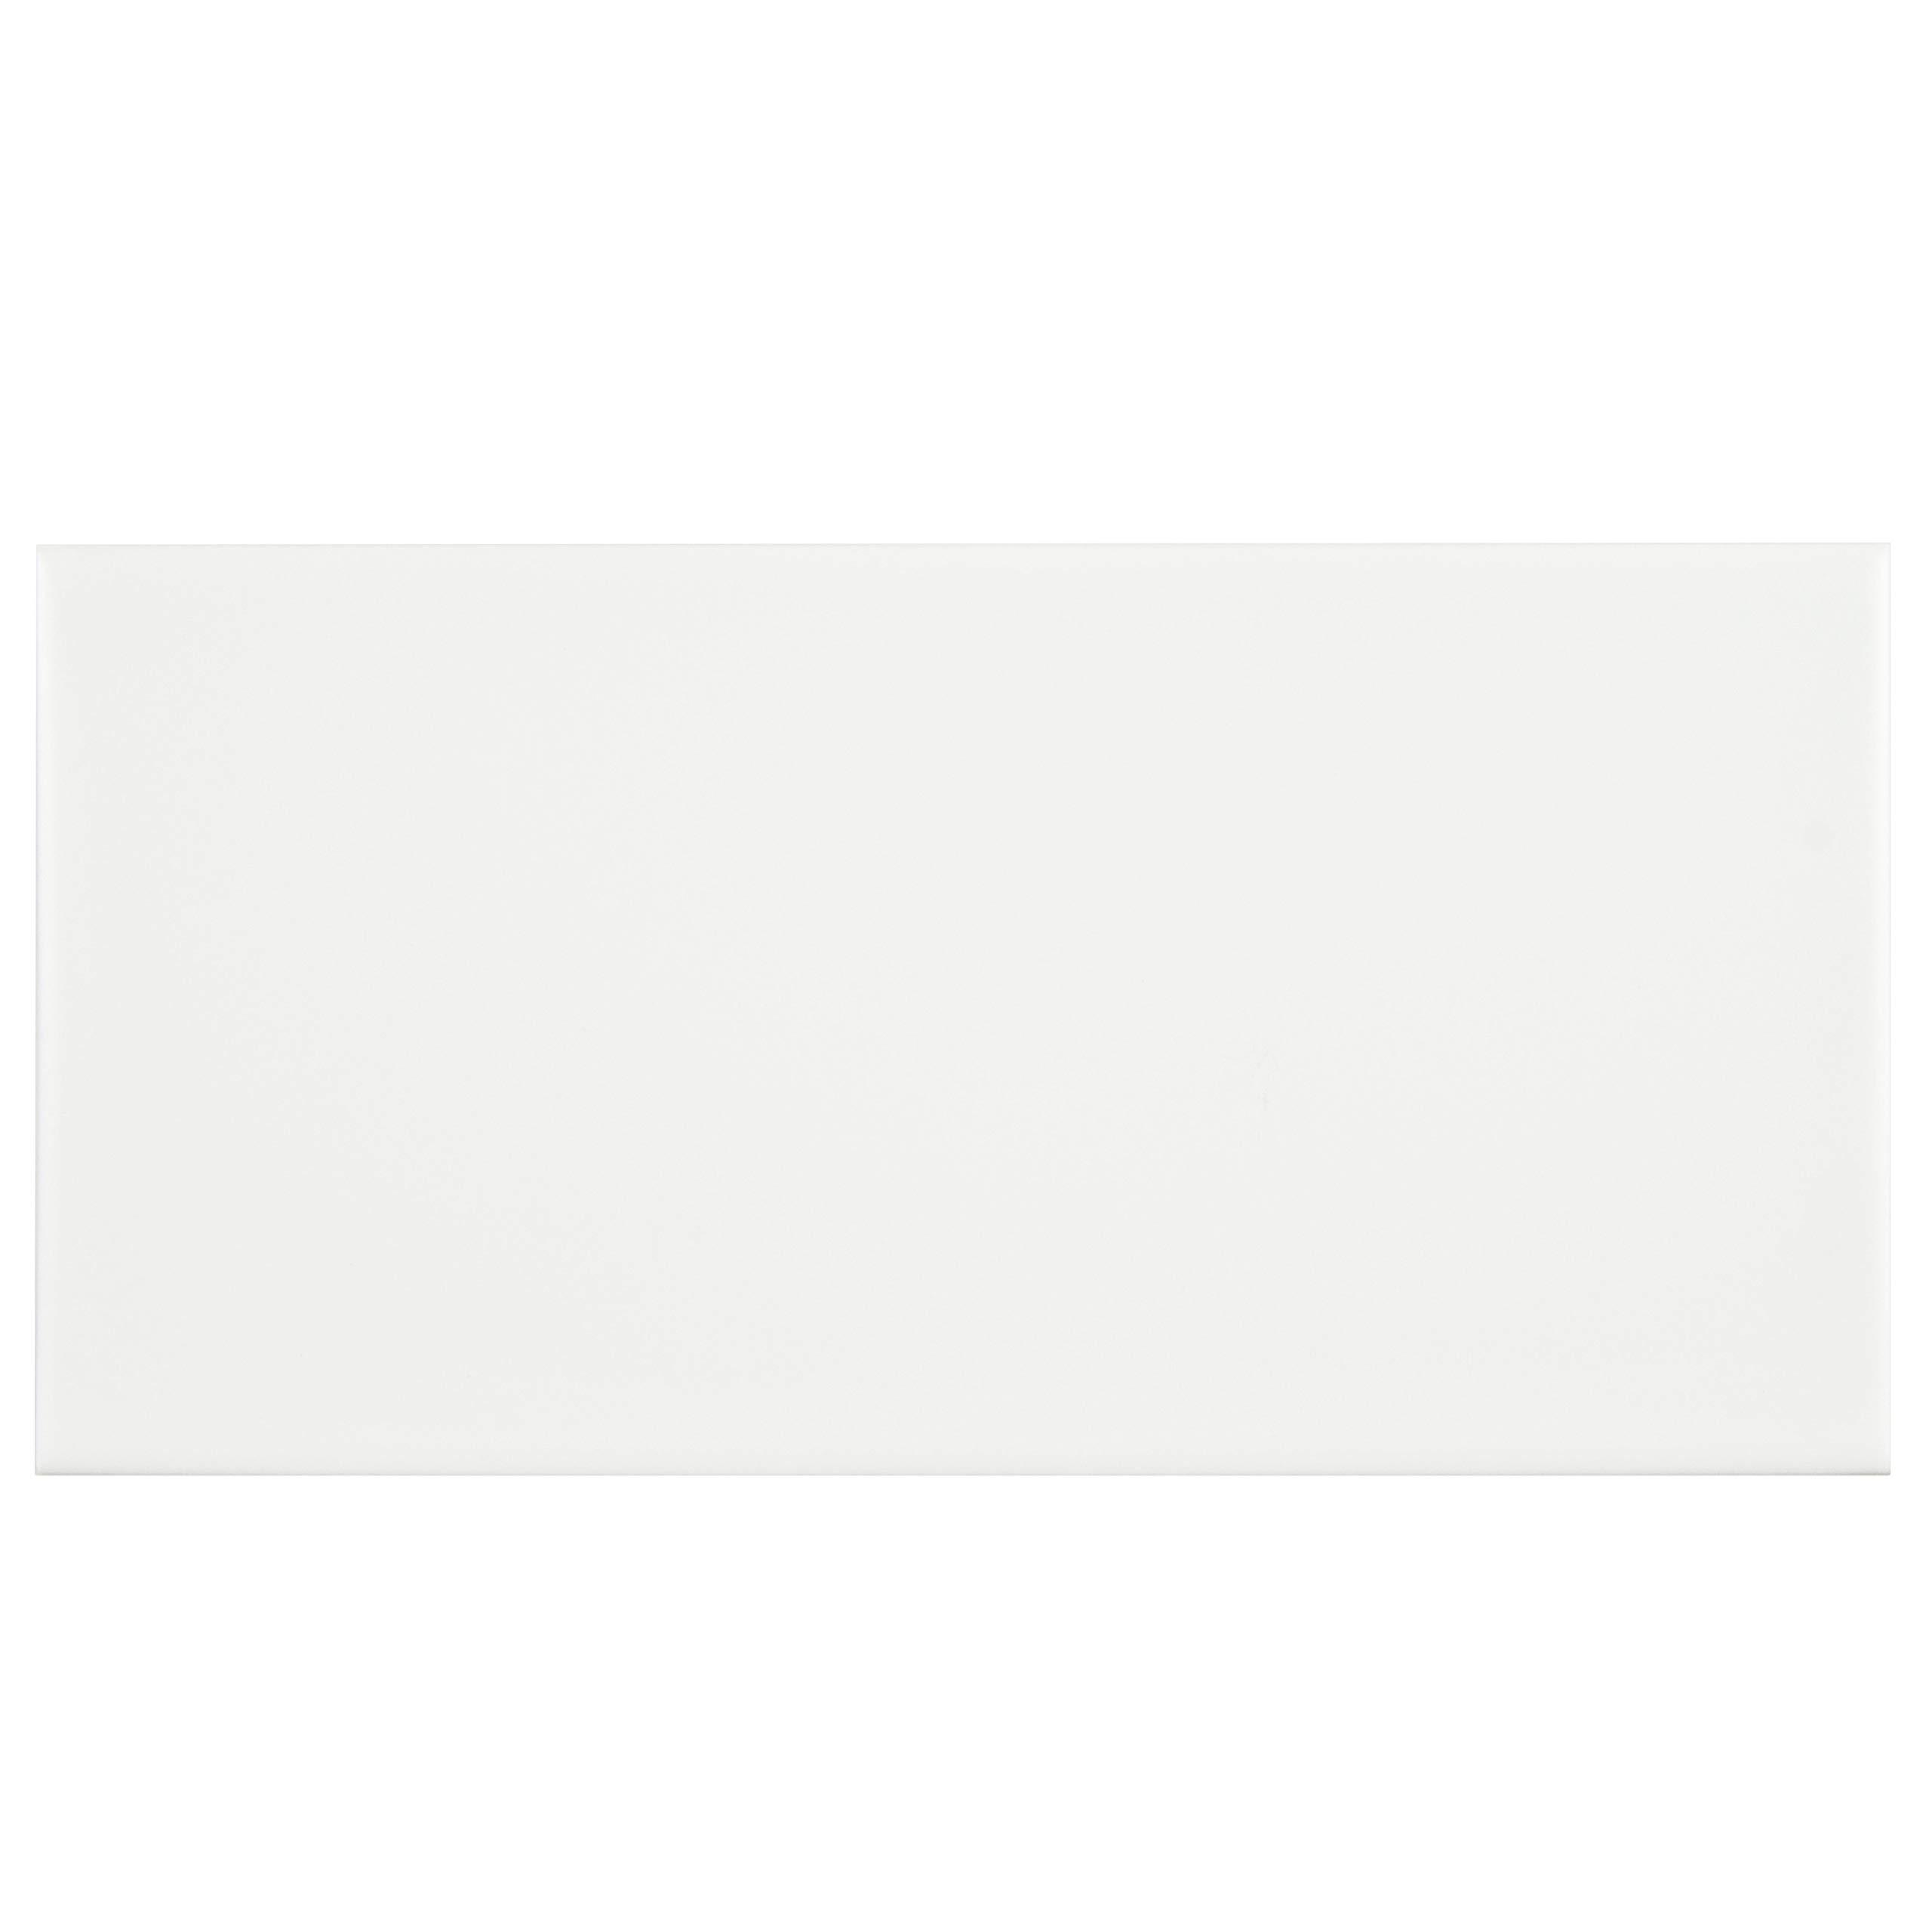 SomerTile FRC8PRNM Memoire Ceramic Floor and Wall, 3.875'' x 7.75'', White Tile, 50 Piece